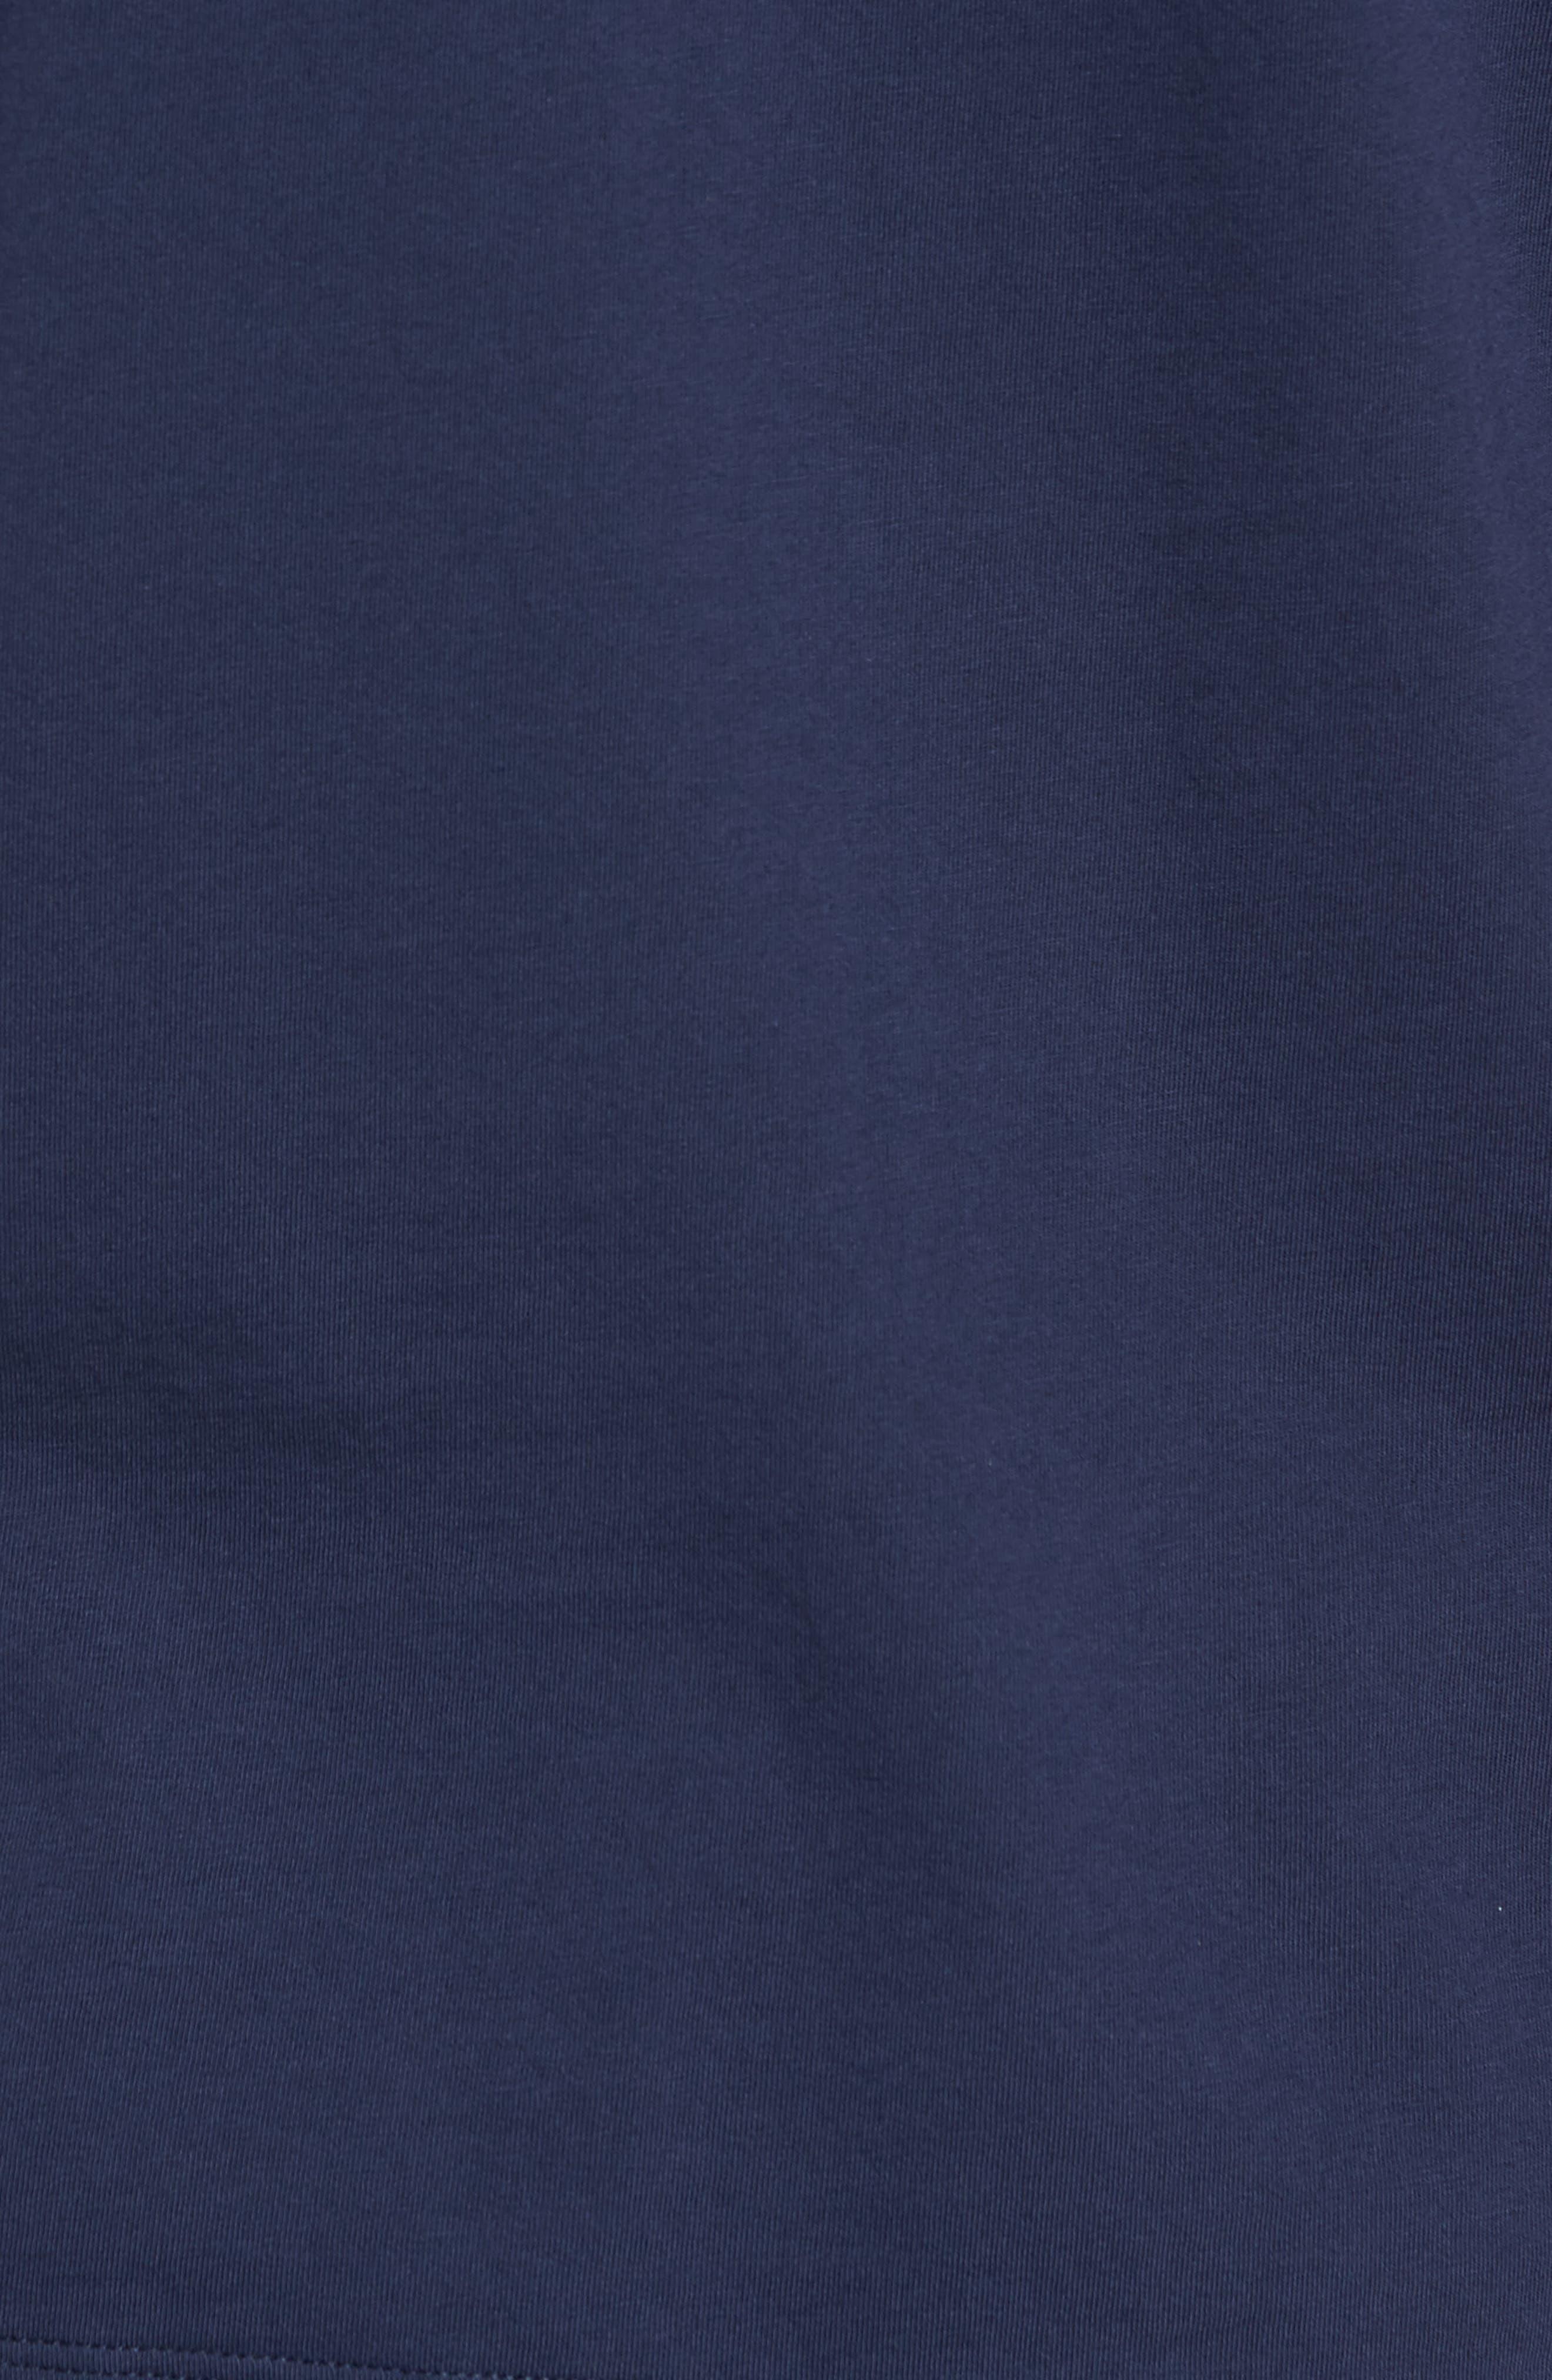 Grindstone Slim Fit Polo,                             Alternate thumbnail 5, color,                             410